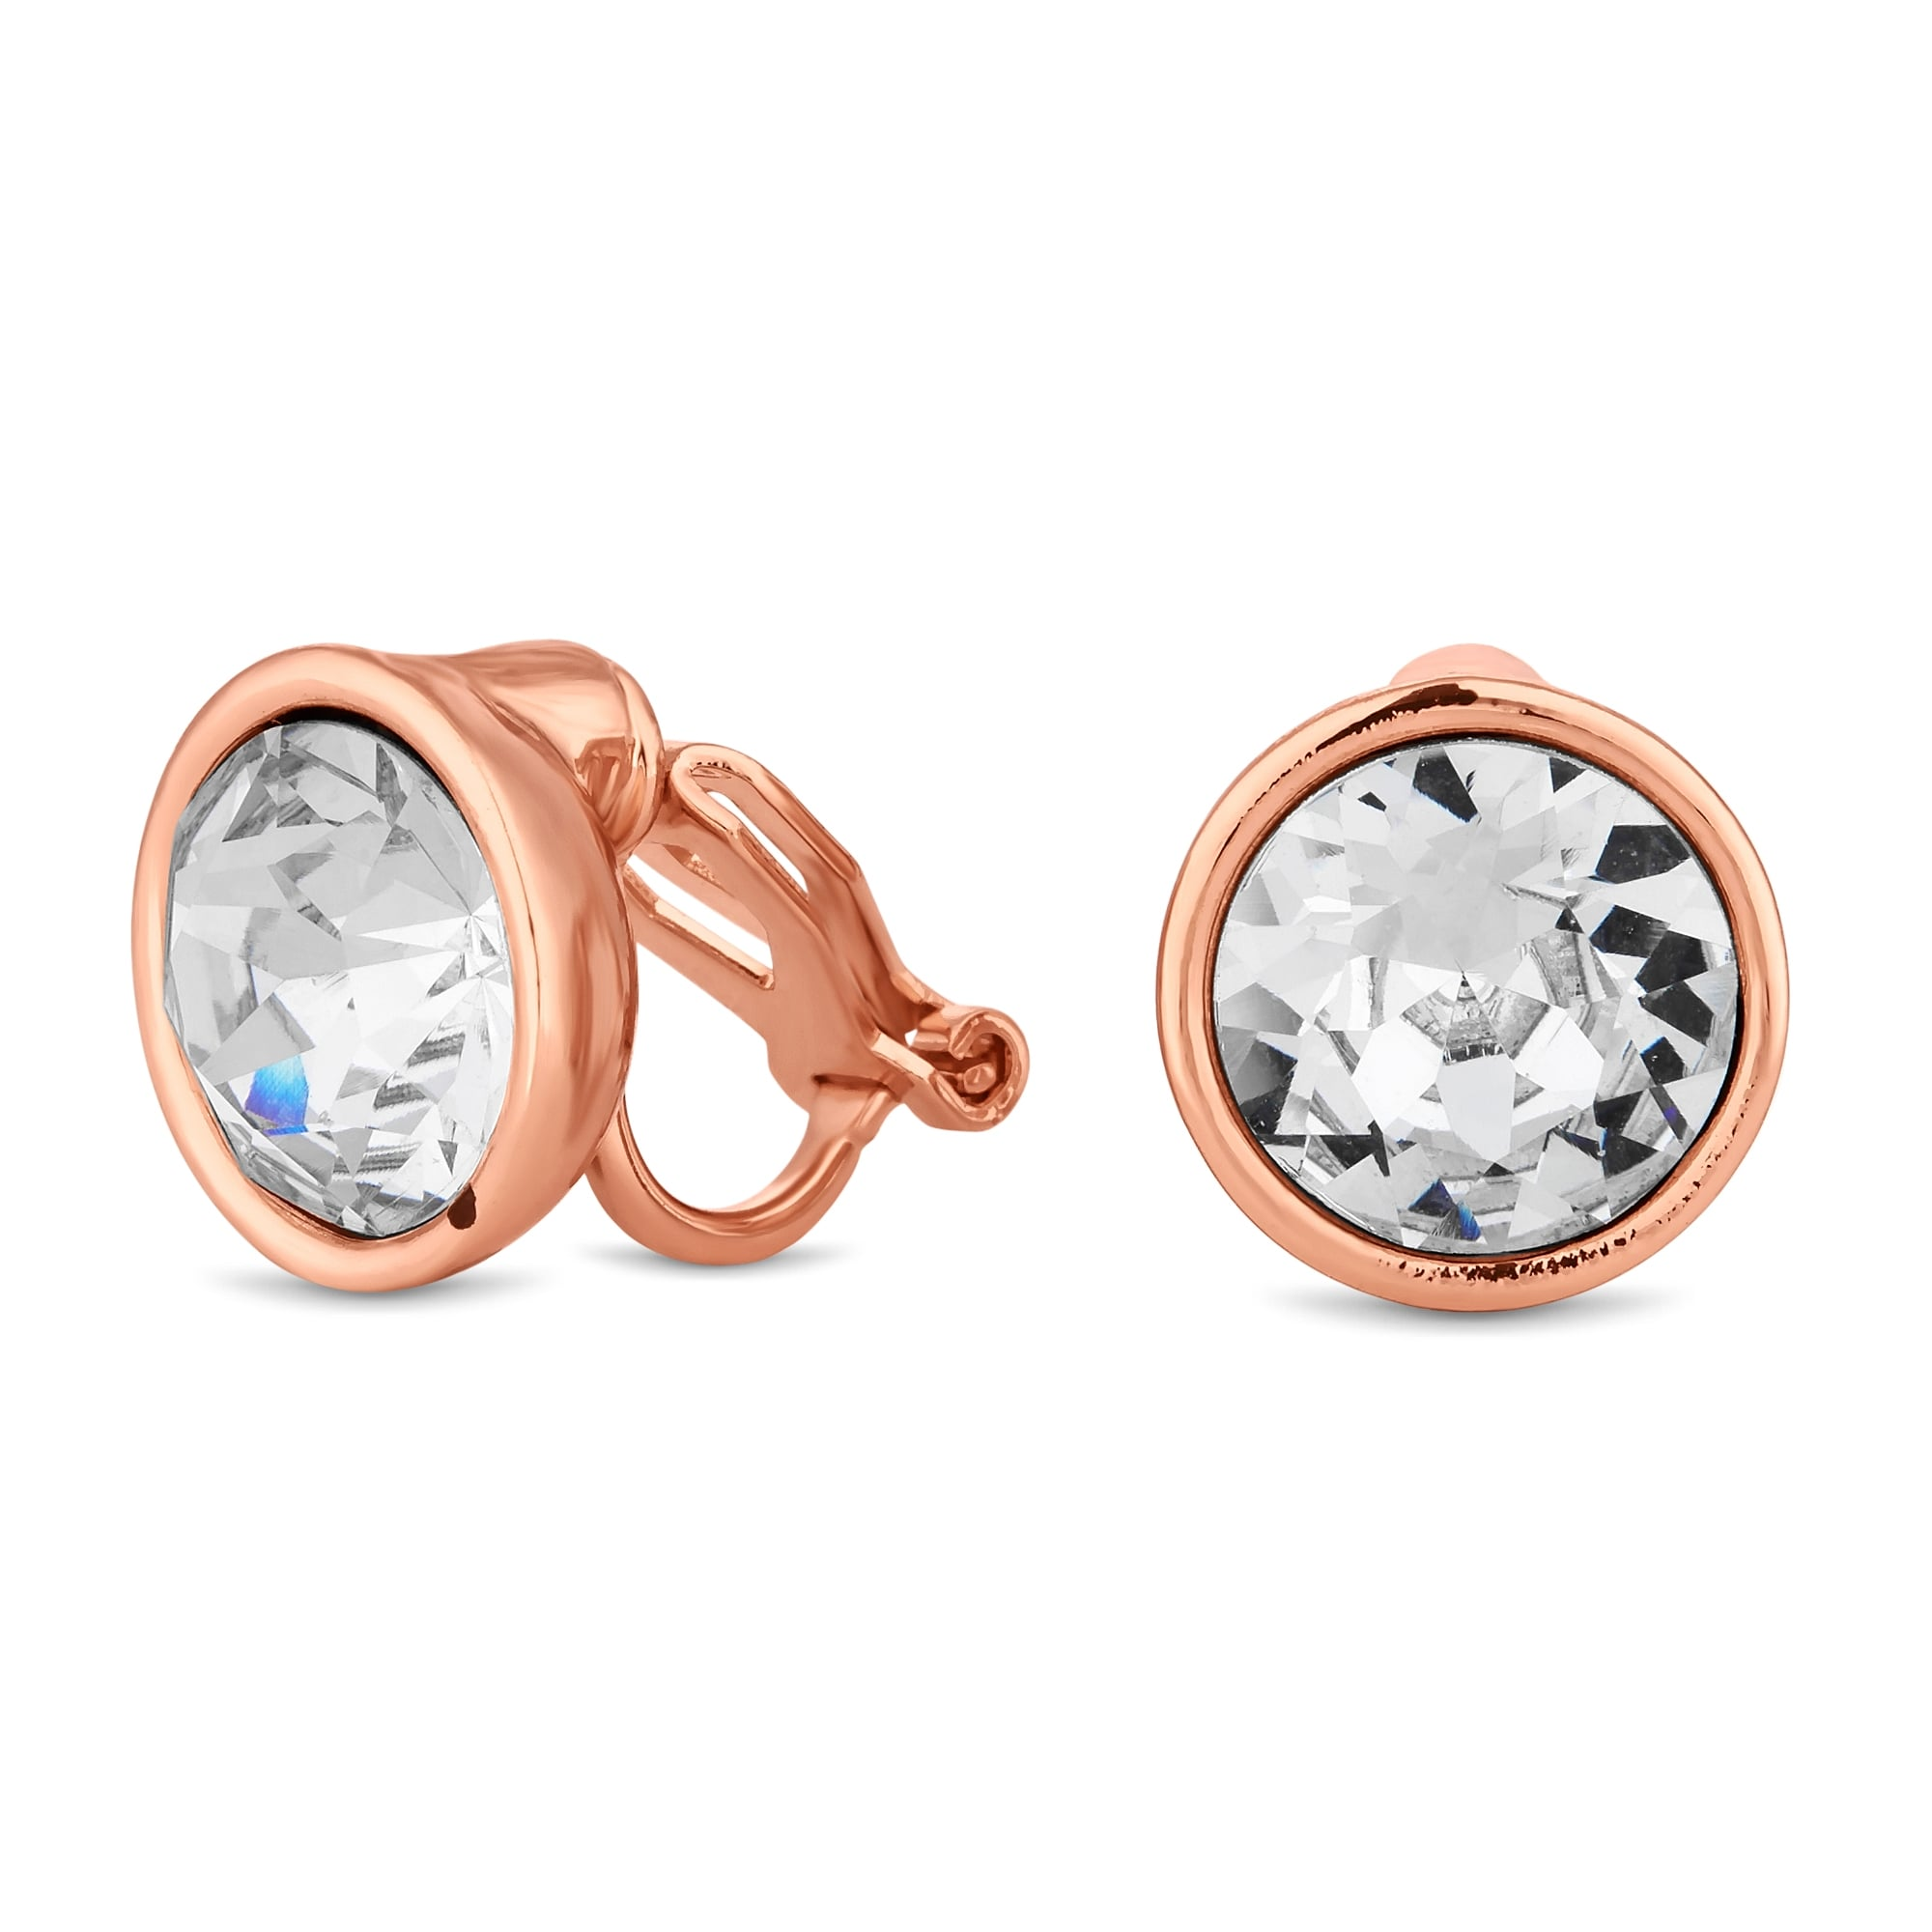 Rose Gold Crystal Clip On Earring Embellished With Swarovski Crystals